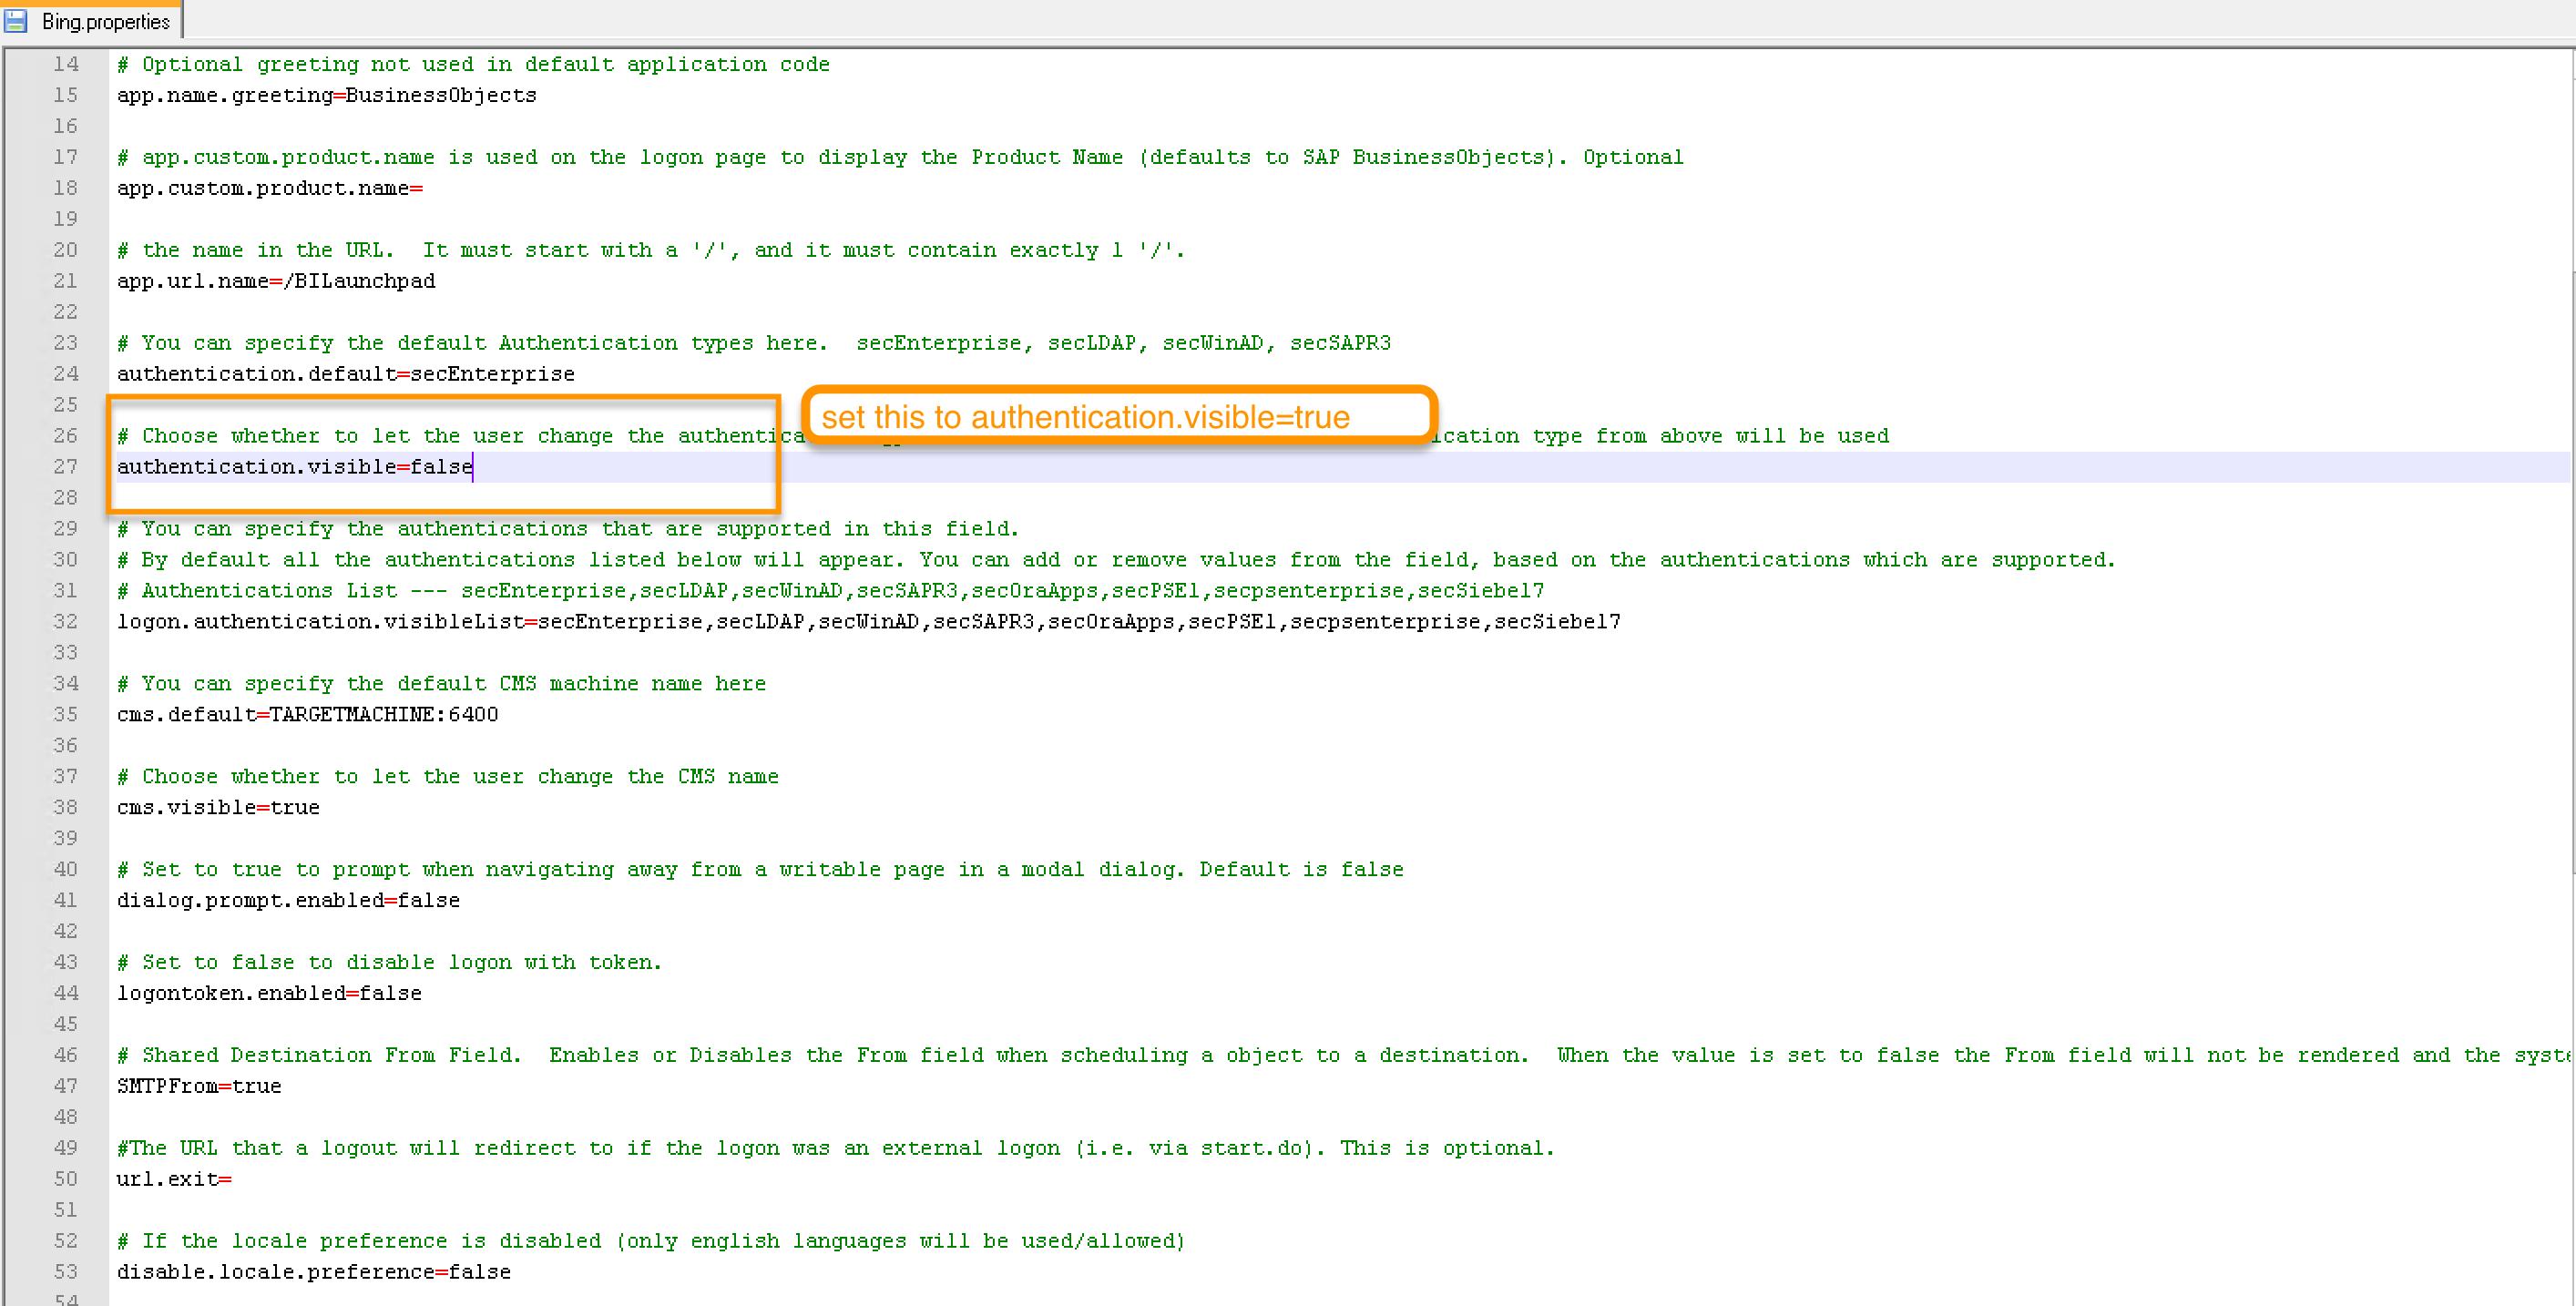 Fiorified Bi Launchpad In Boe 42 Sap Blogs